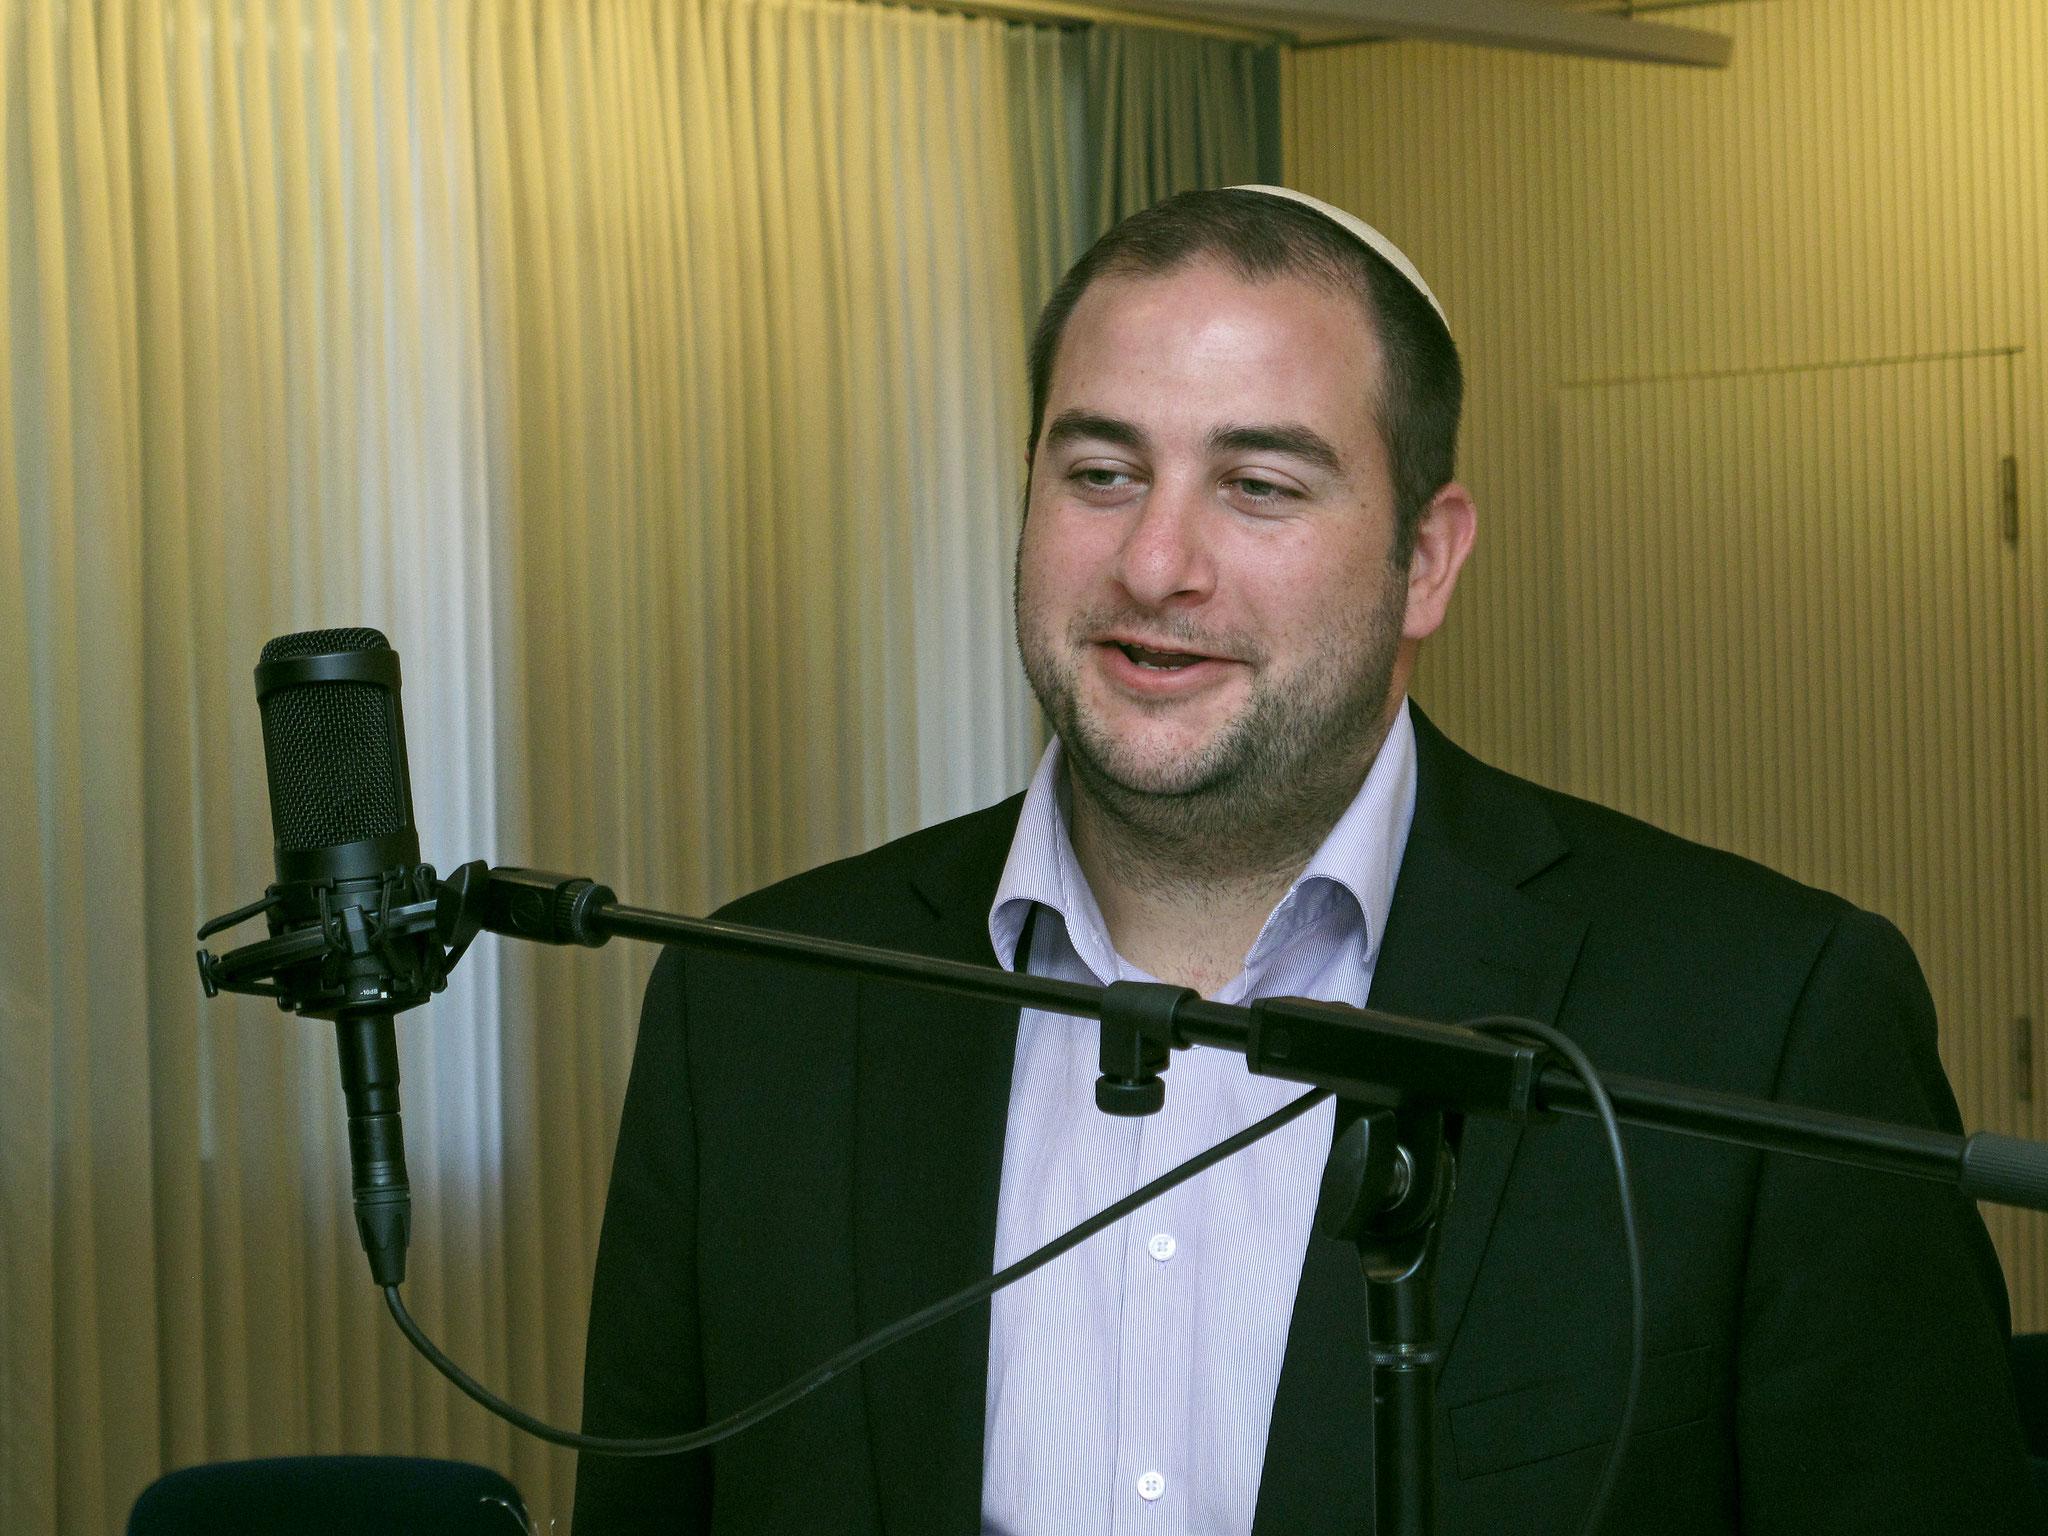 Rabbiner Michael Kohn